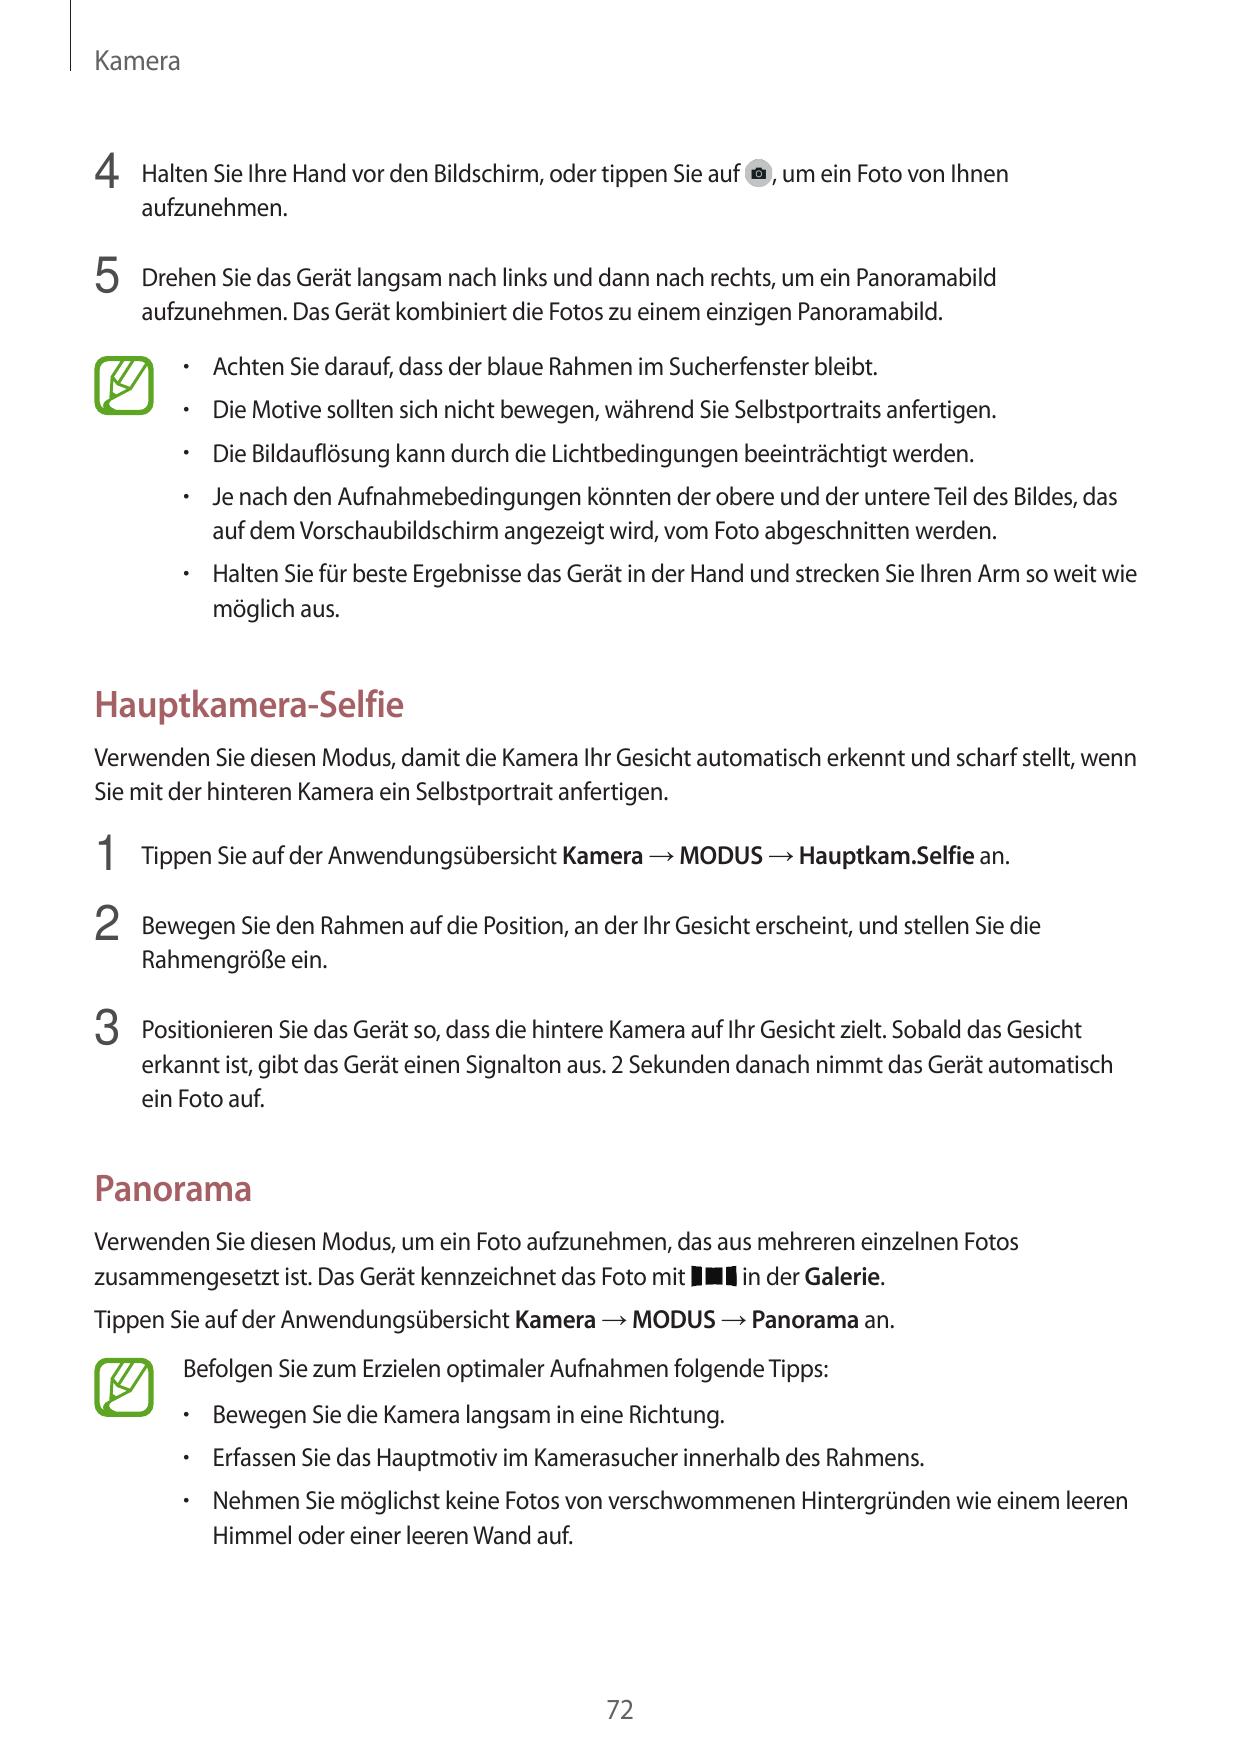 Bedienungsanleitung - Samsung Galaxy A5 - Android 4.4 - mobilcom ...